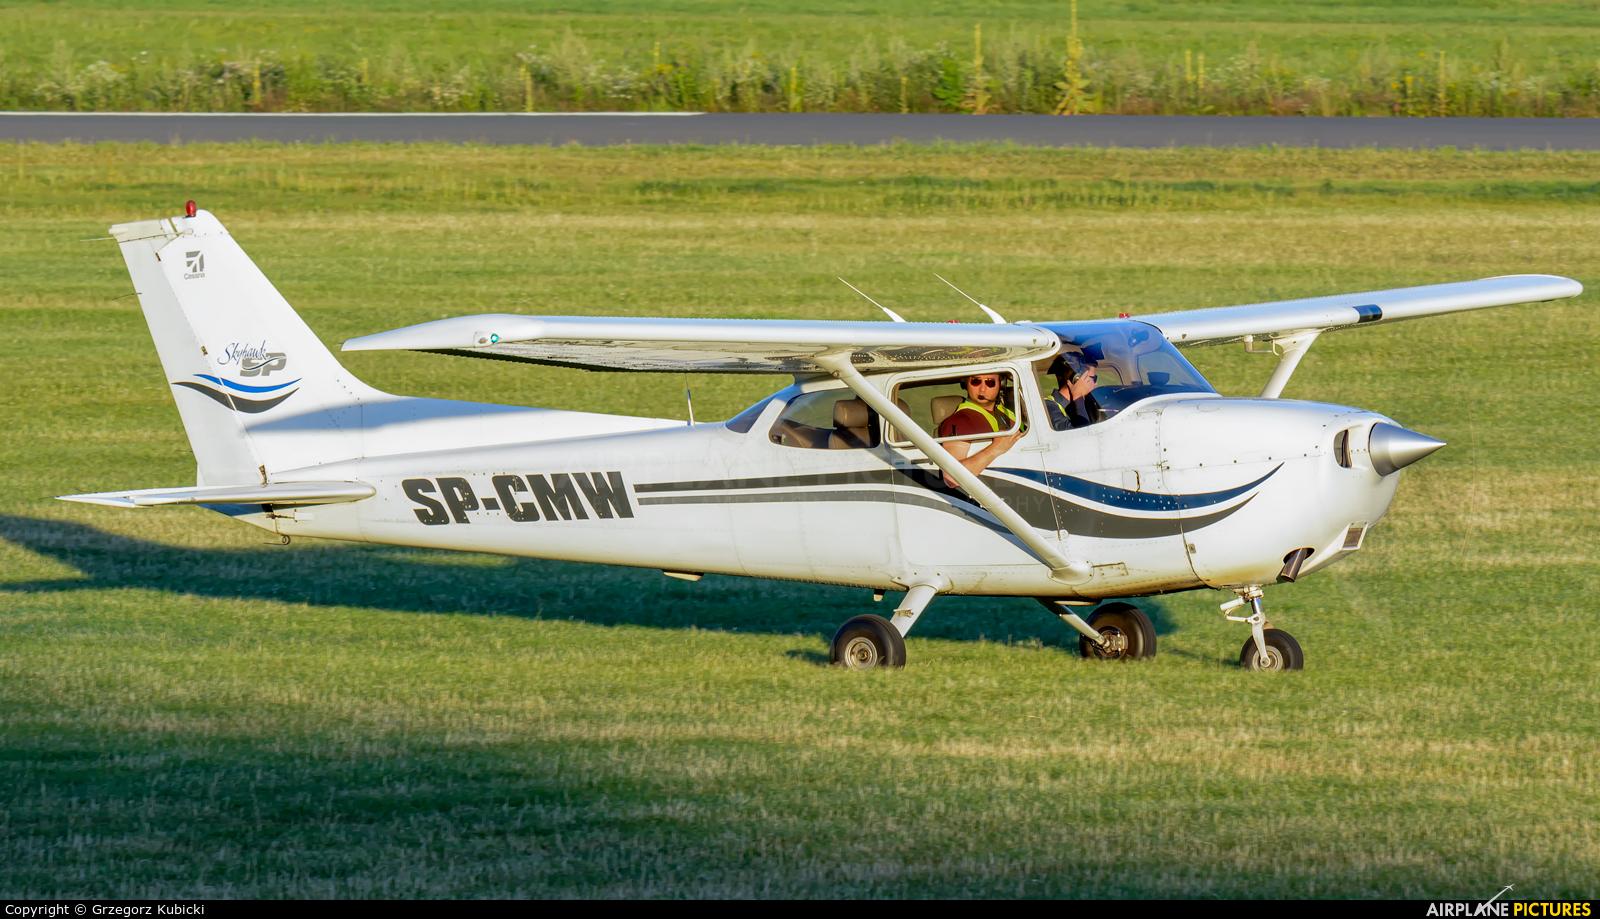 Aeroklub Śląski SP-CMW aircraft at Katowice Muchowiec